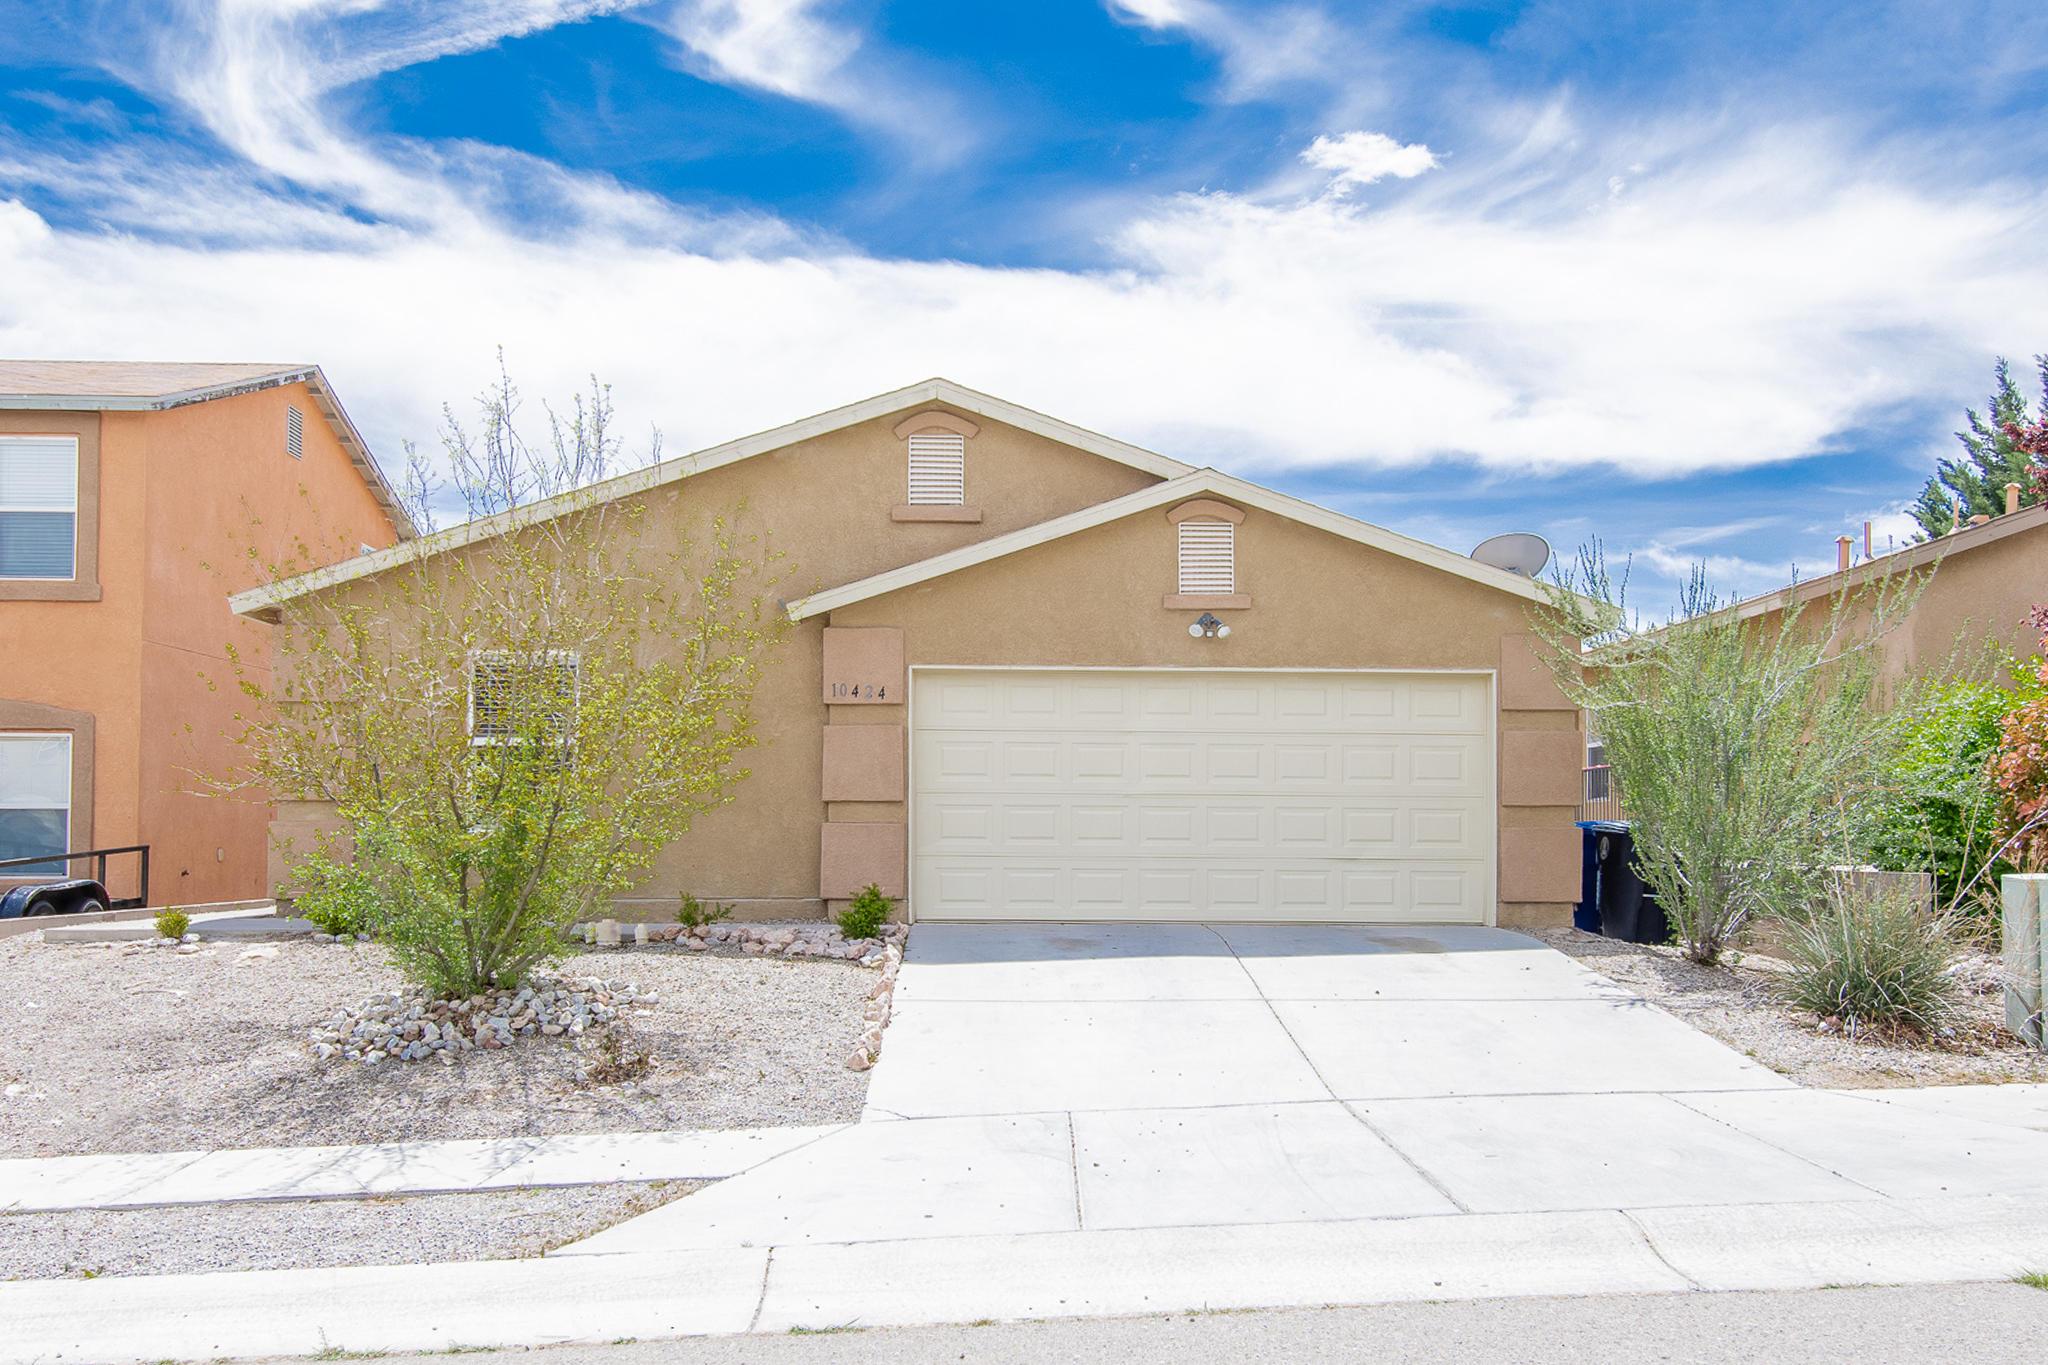 Photo of 10424 Gila Gulch Road SW, Albuquerque, NM 87121